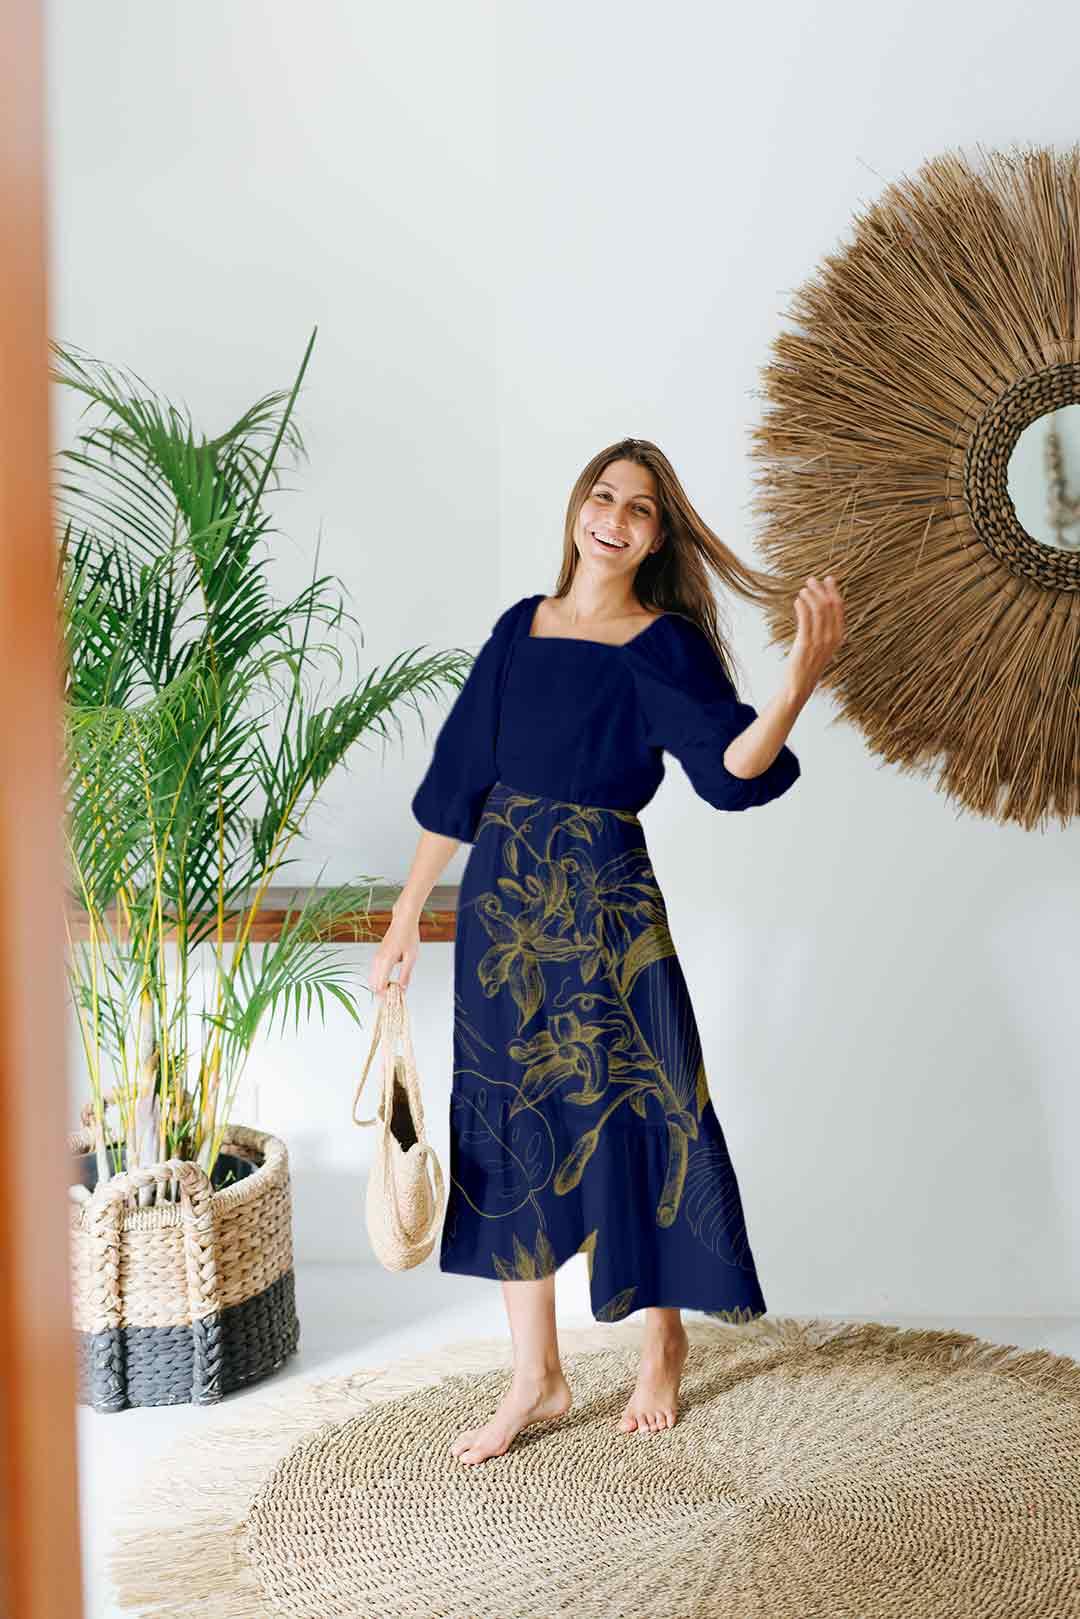 Cotton Frock Style Dress – Stencil